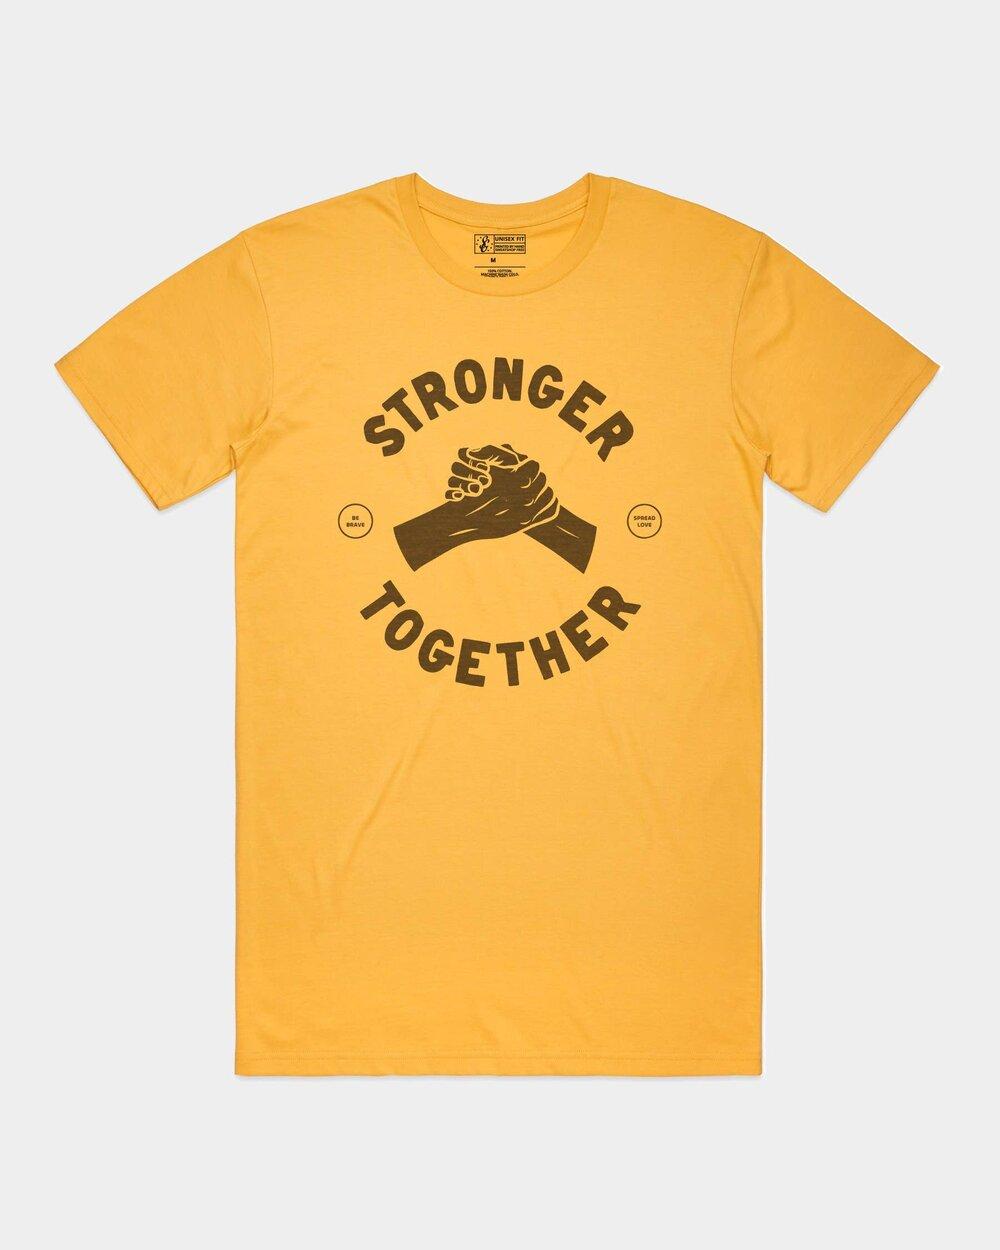 Stronger Together Tee.jpeg